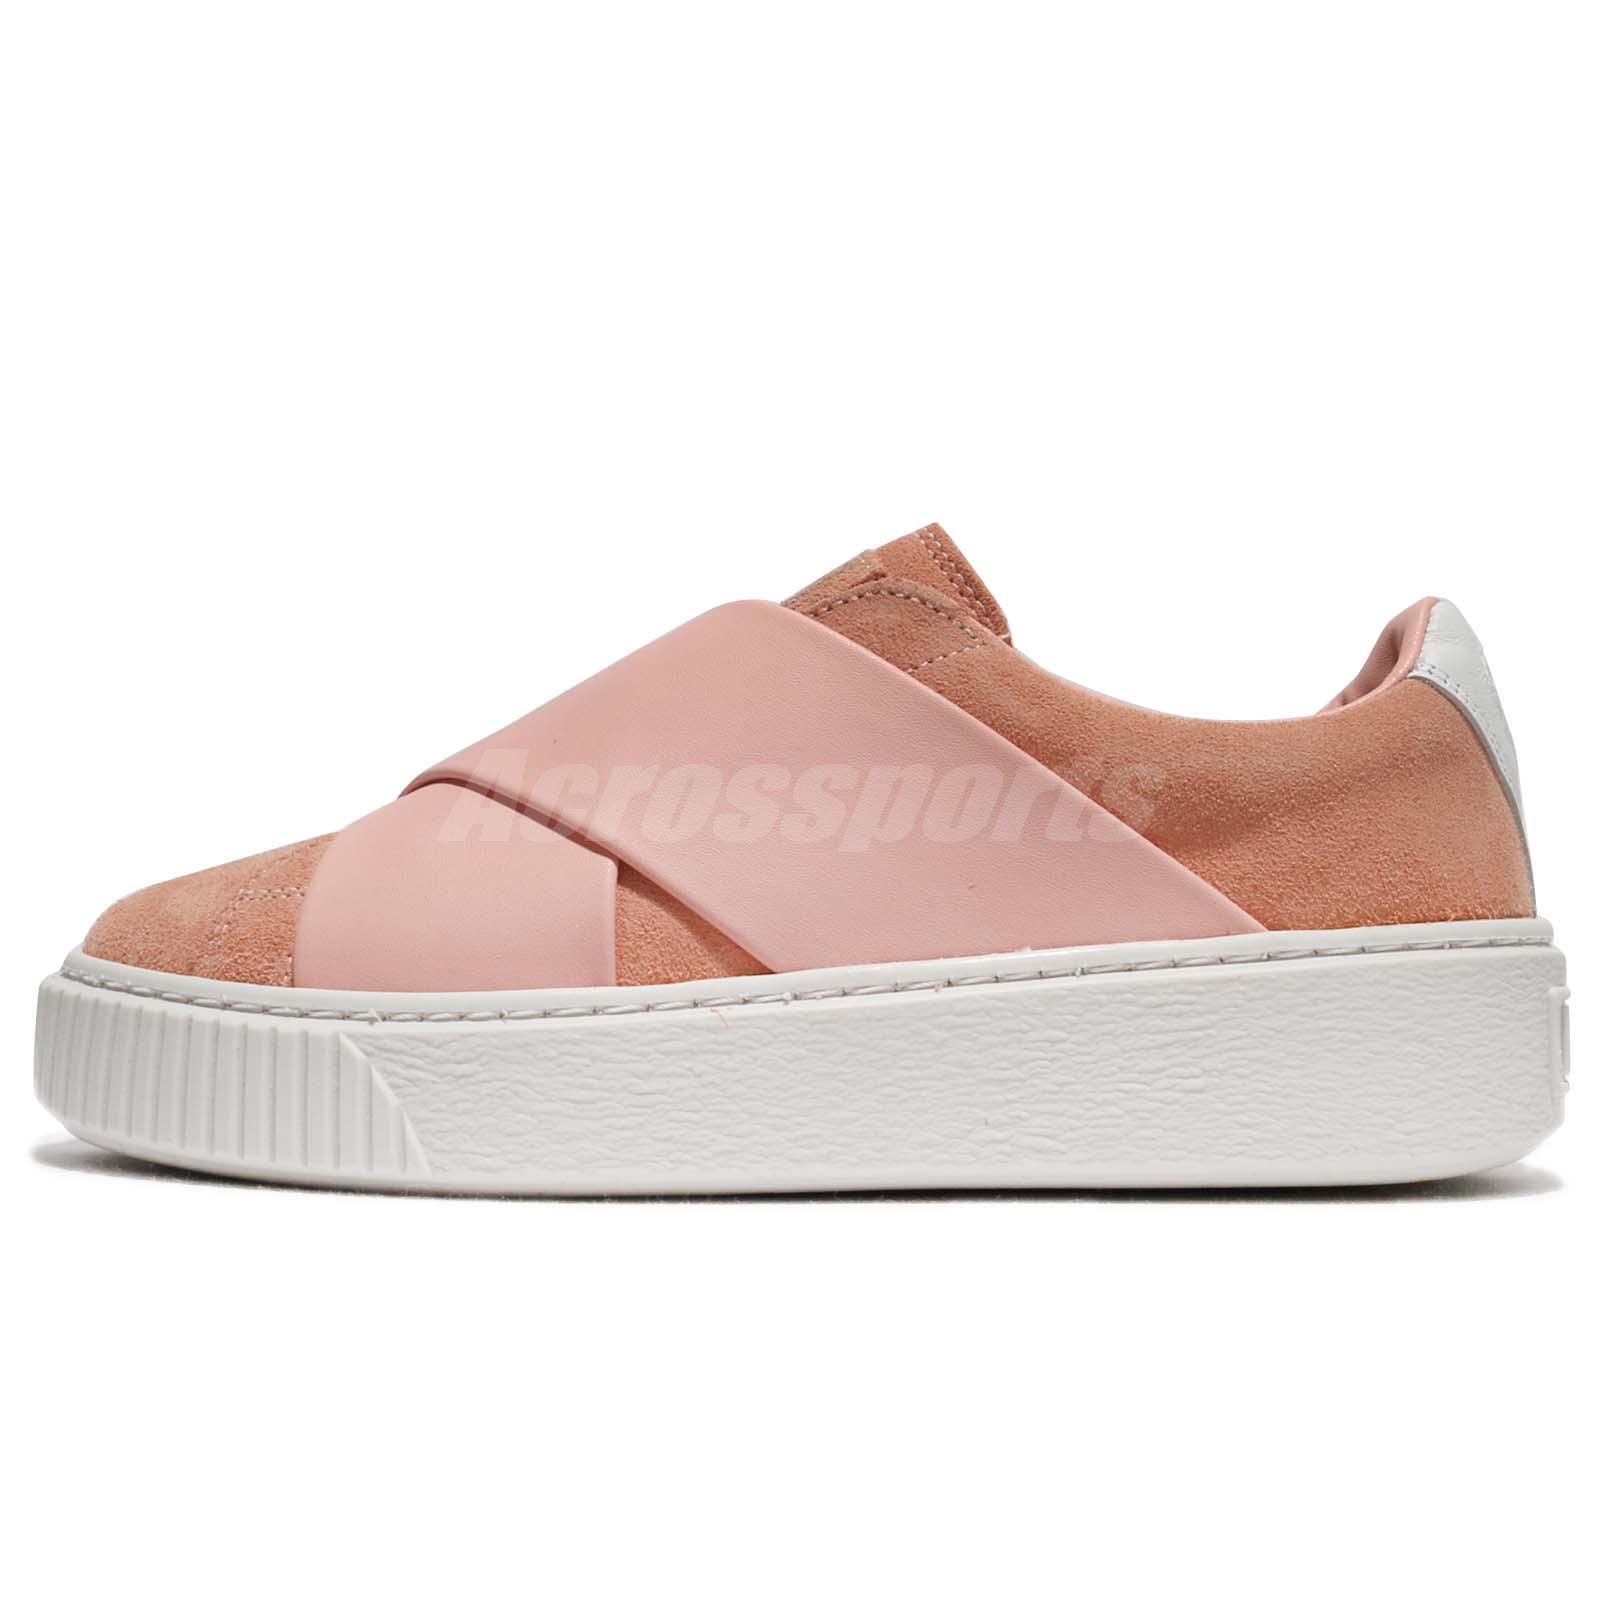 f4b3f0331fc Puma Platform X Wns Peach Beige Pink White Women Shoes Sneakers 365477-02